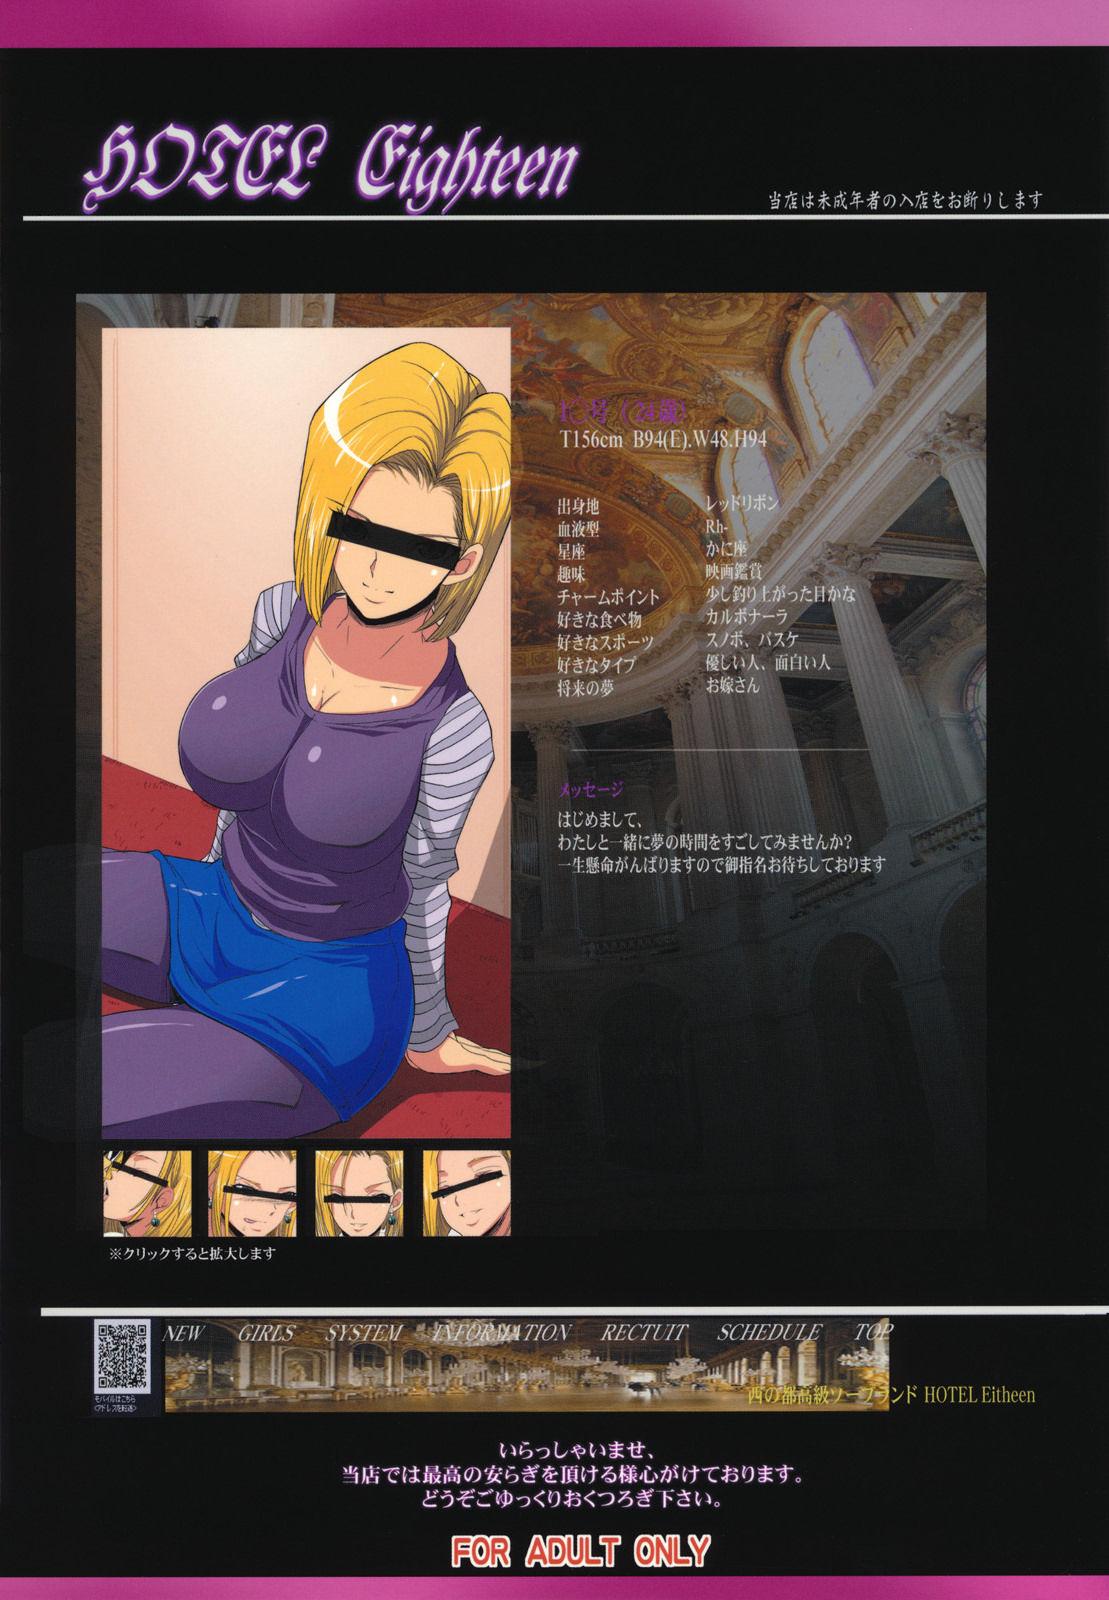 (C79) [Youkai Tamanokoshi (CHIRO)] Koukyuu Soapland Hitozuma 18-Gou Ten - High-Class House Wife Soap Land - No. 18..